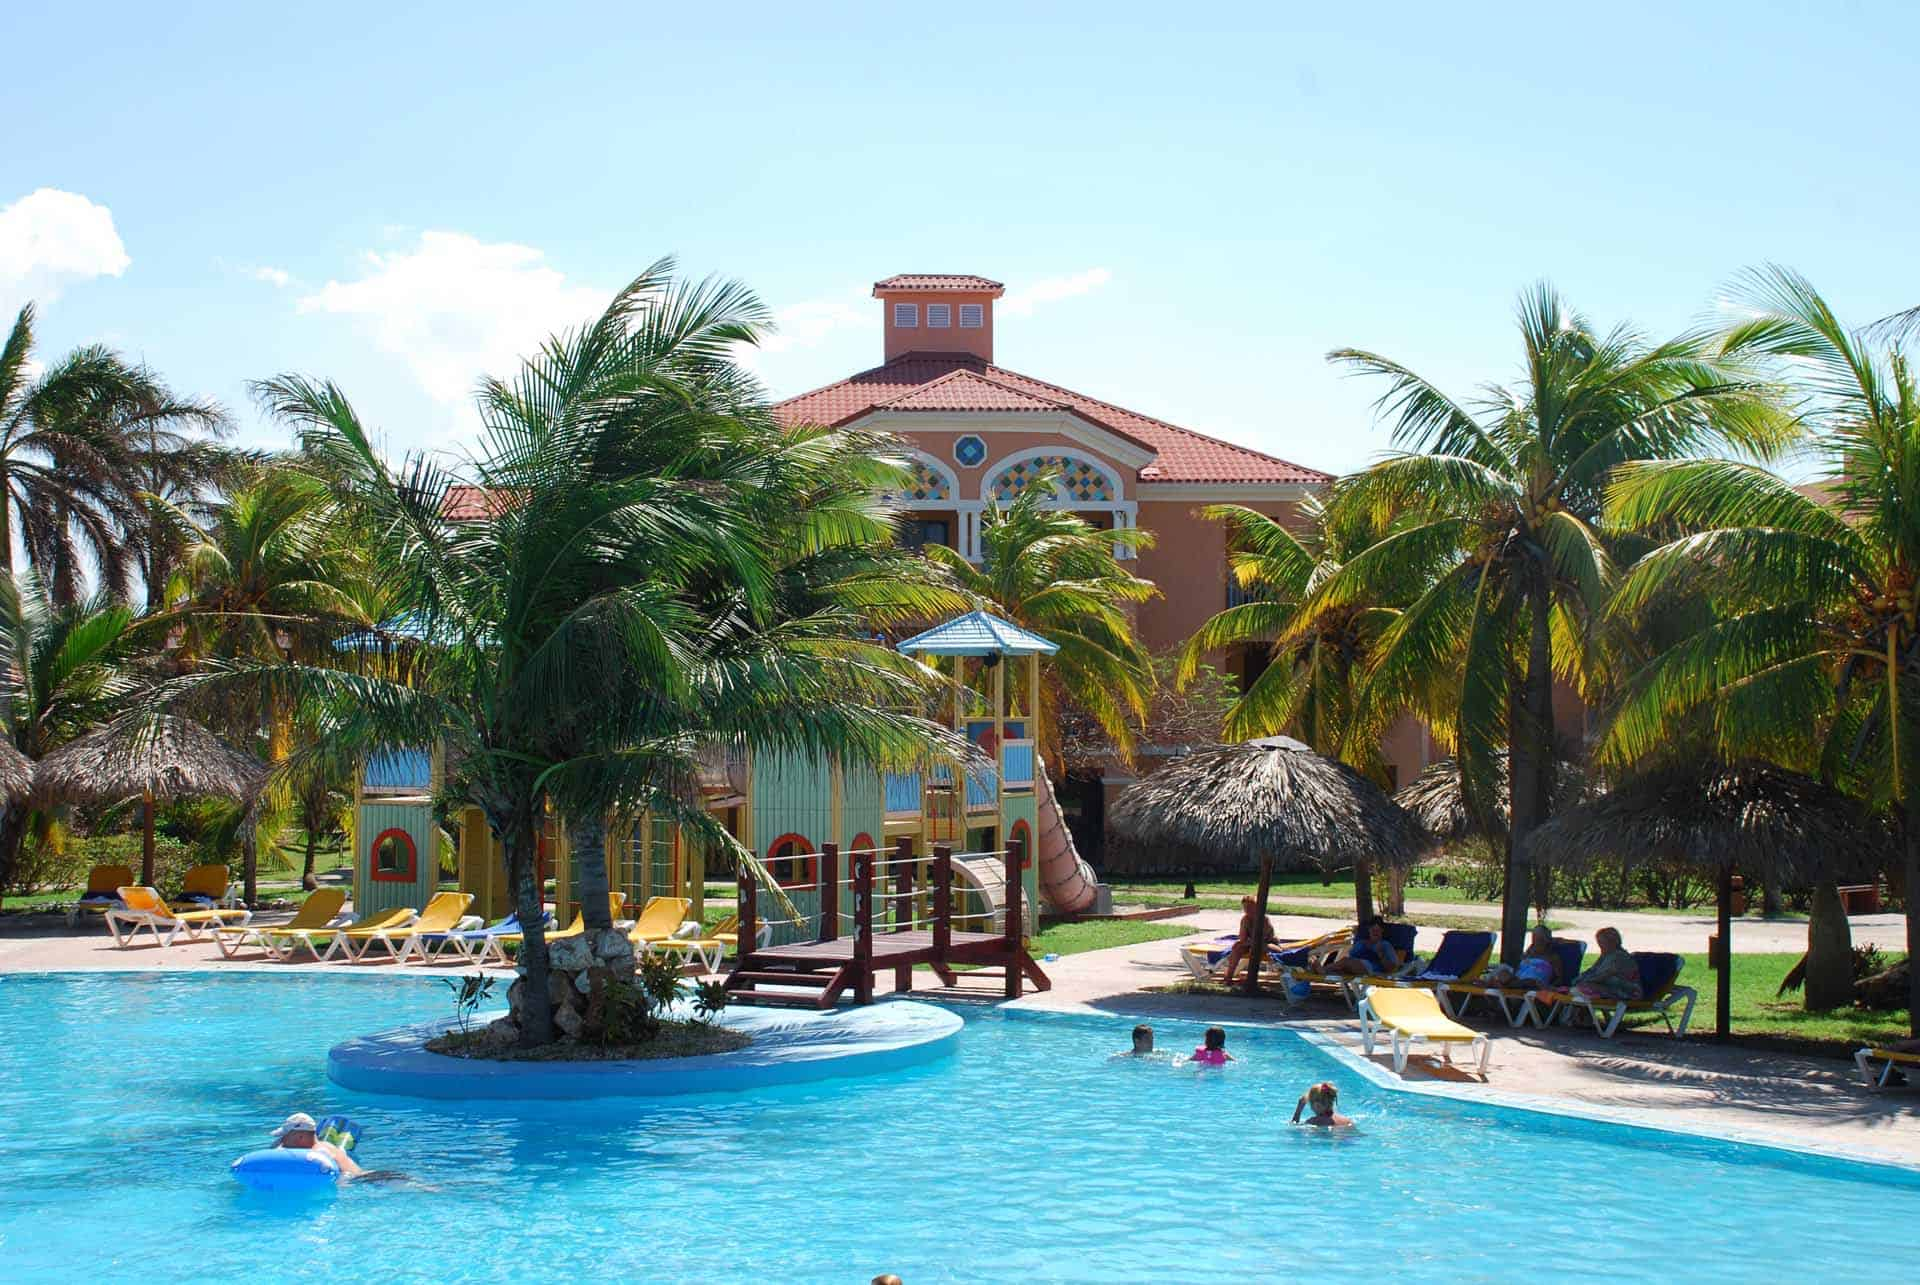 varadero hotel piscine cuba autrement 3